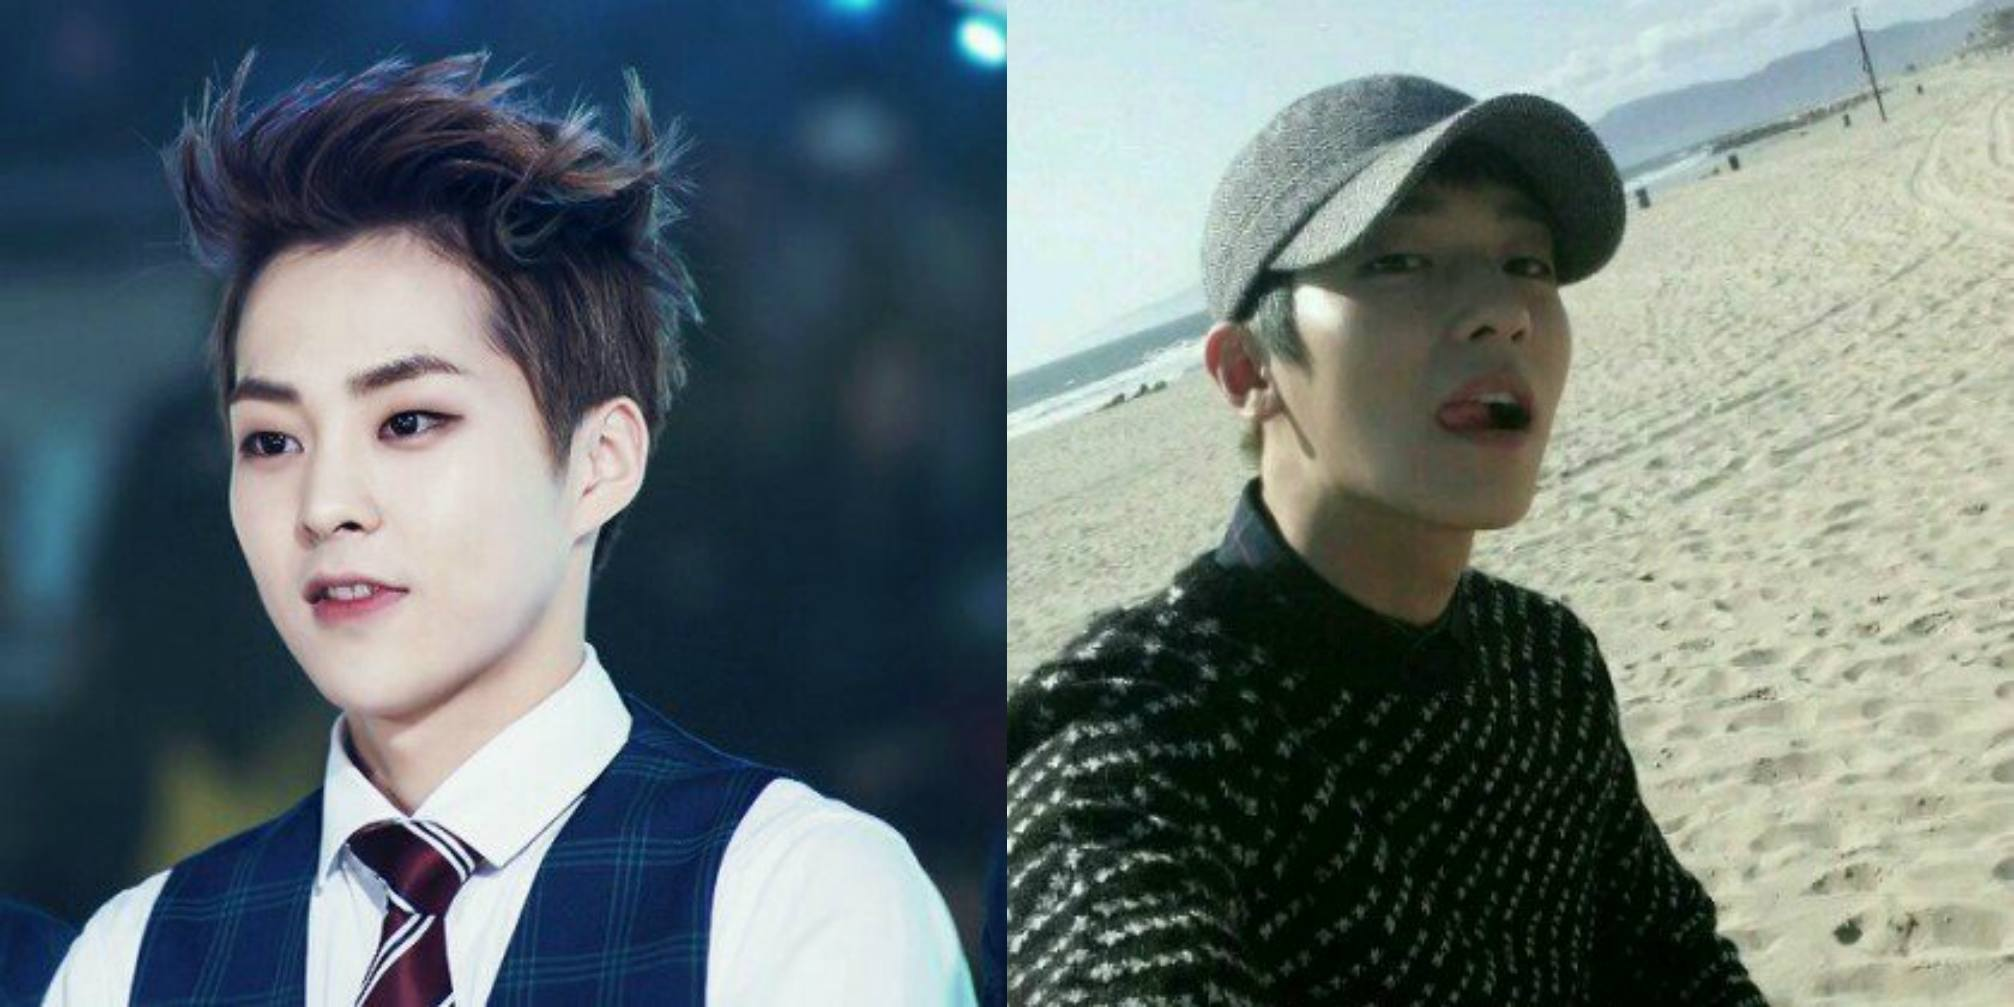 EXO Xiumin and TEEN TOP L.Joe